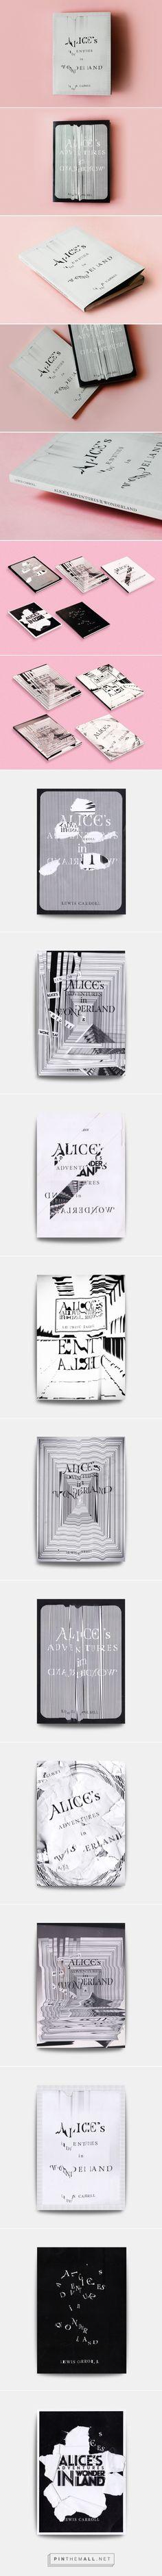 Alice's Adventures in Wonderland | Book cover design on Behance by Frankie . https://www.behance.net/gallery/25047705/Alices-Adventures-in-Wonderland-Book-cover-design